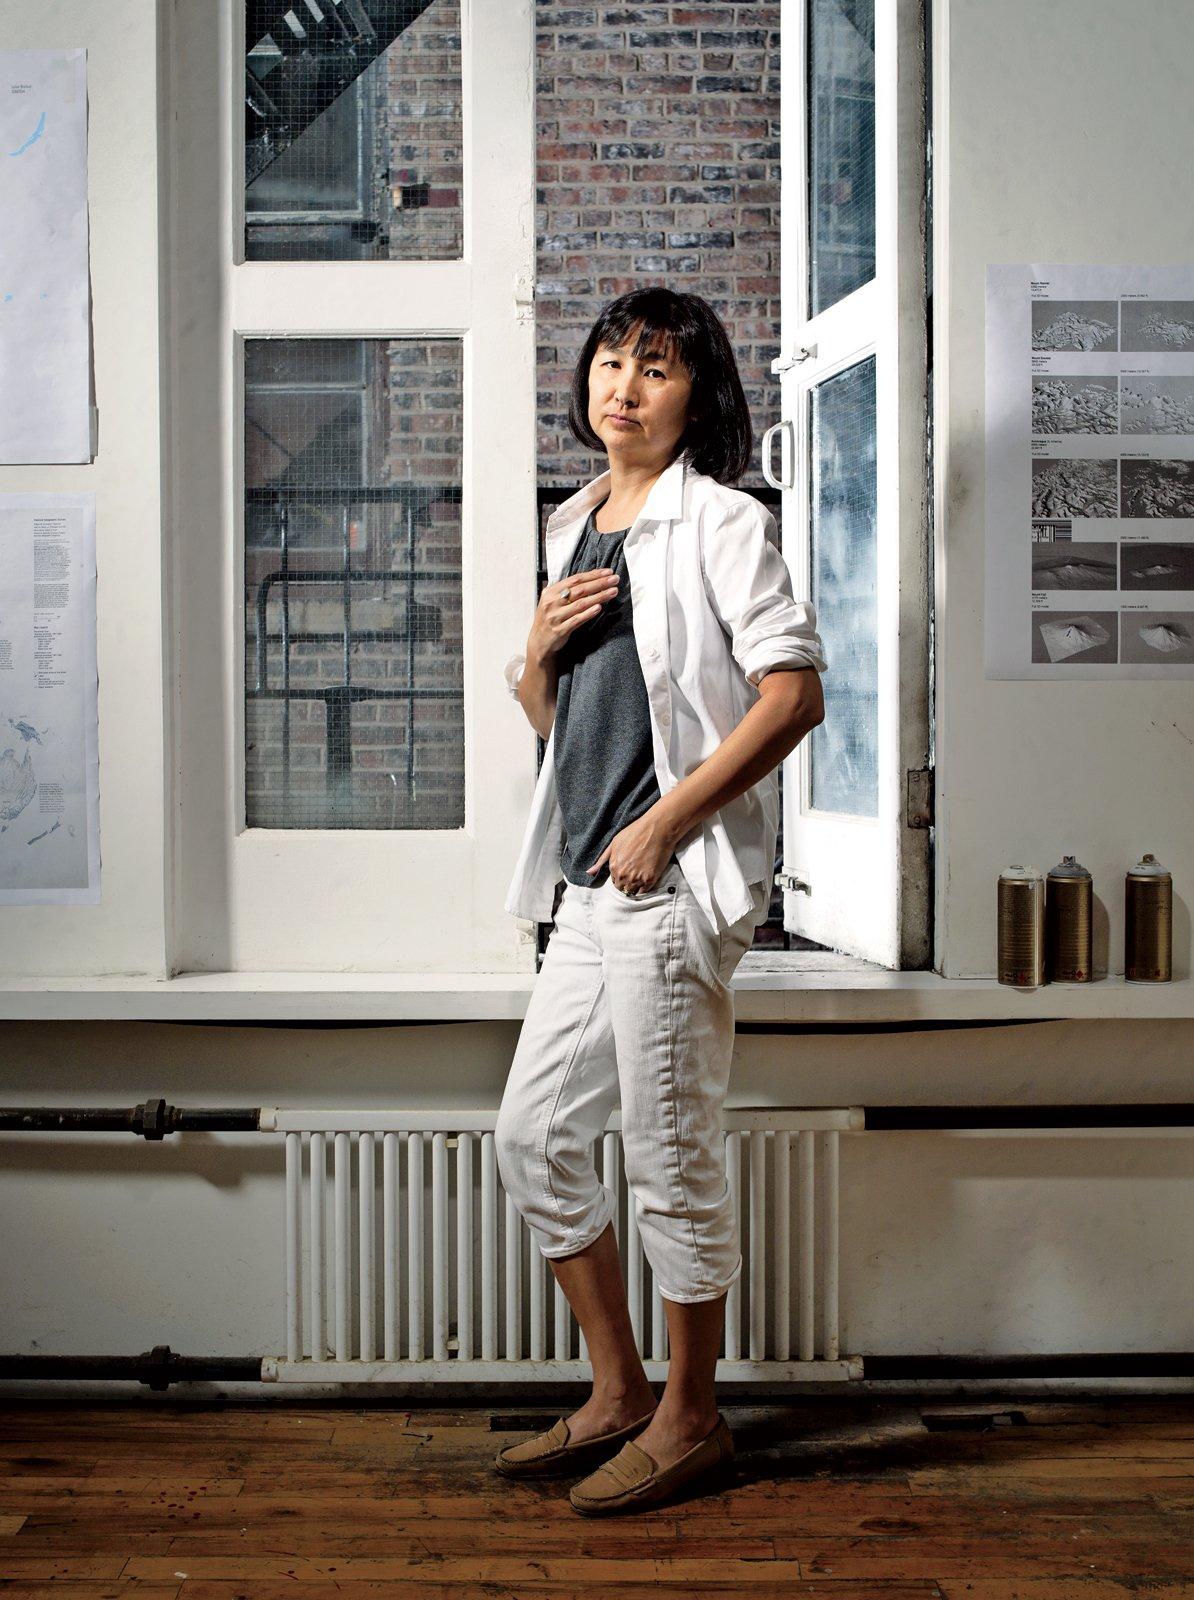 For more on the artist's foundation, visit whatismissing.net